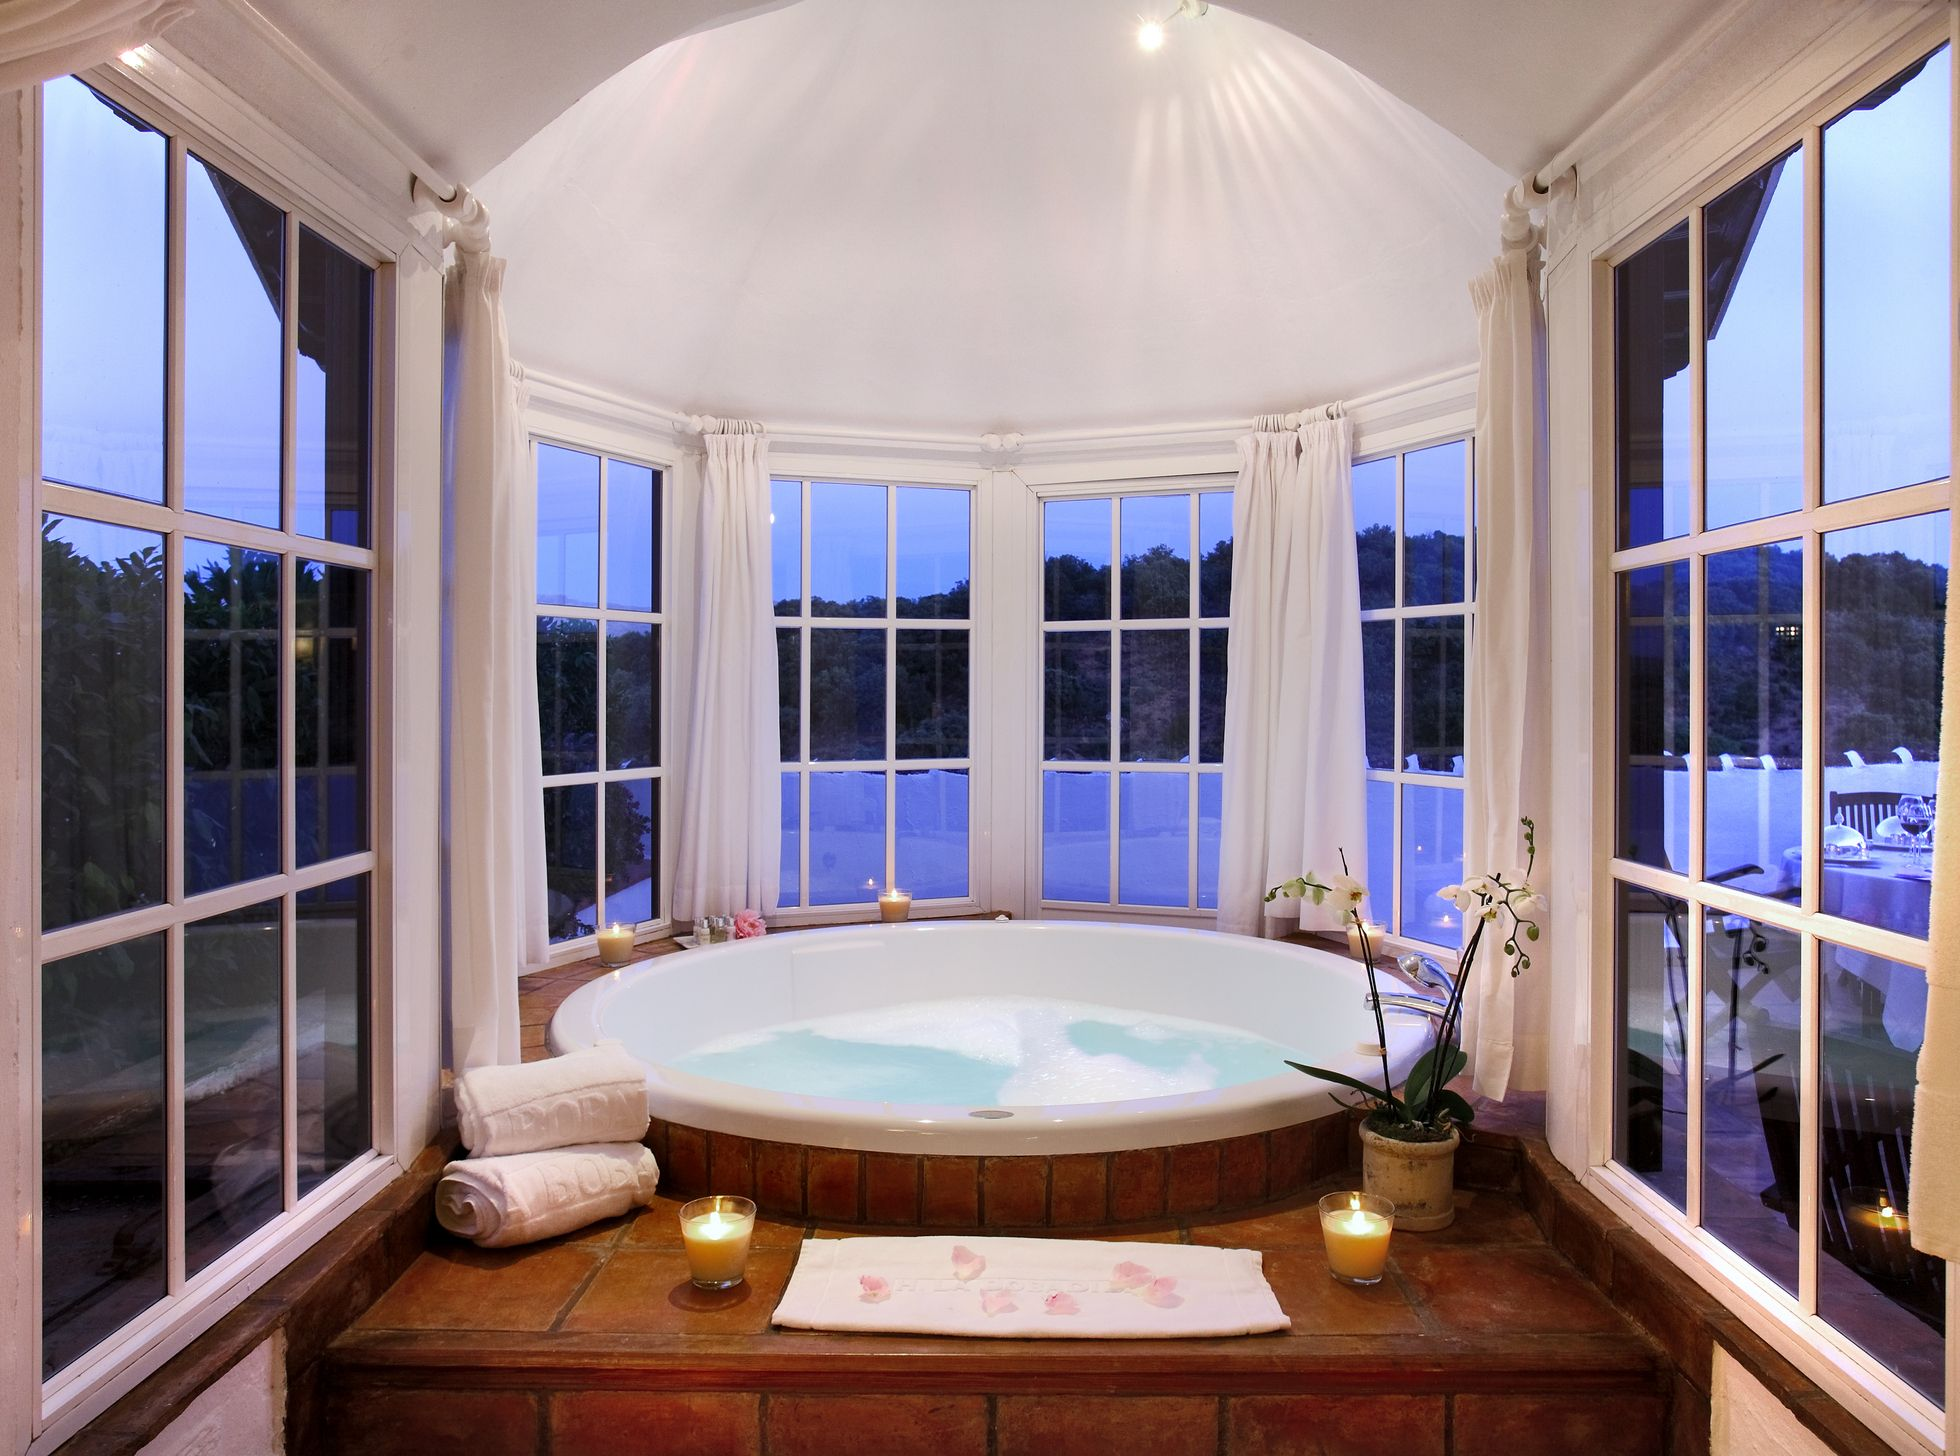 Round Tub Surrounded By Windows At The Barcelo La Bobadilla In Granada Spain Hotel Bathroom Design Luxury Hotel Bathroom Luxury Hotel